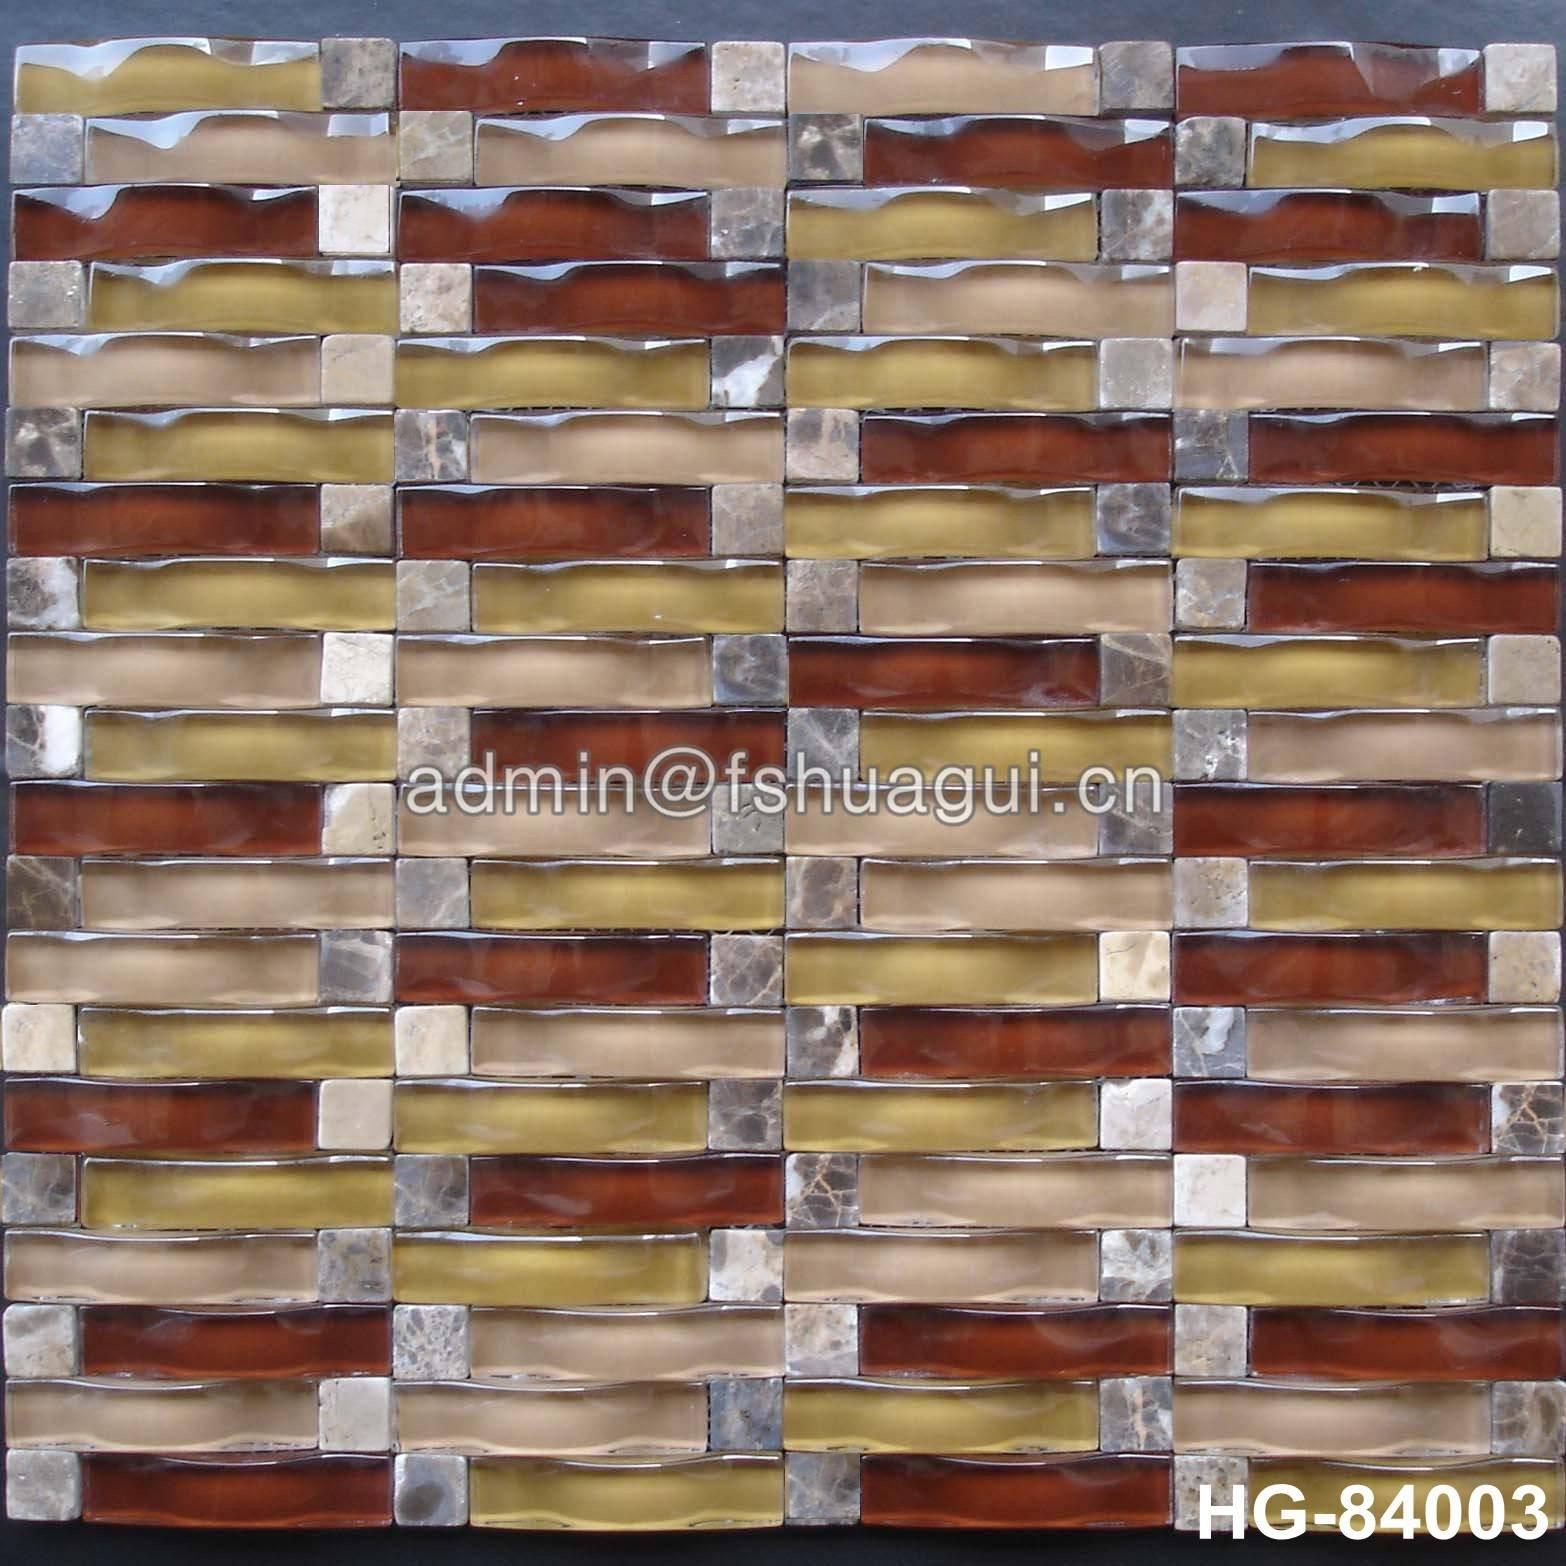 Huagui Glass mosaic tile HG-84003 GLASS MOSAIC TILE image47